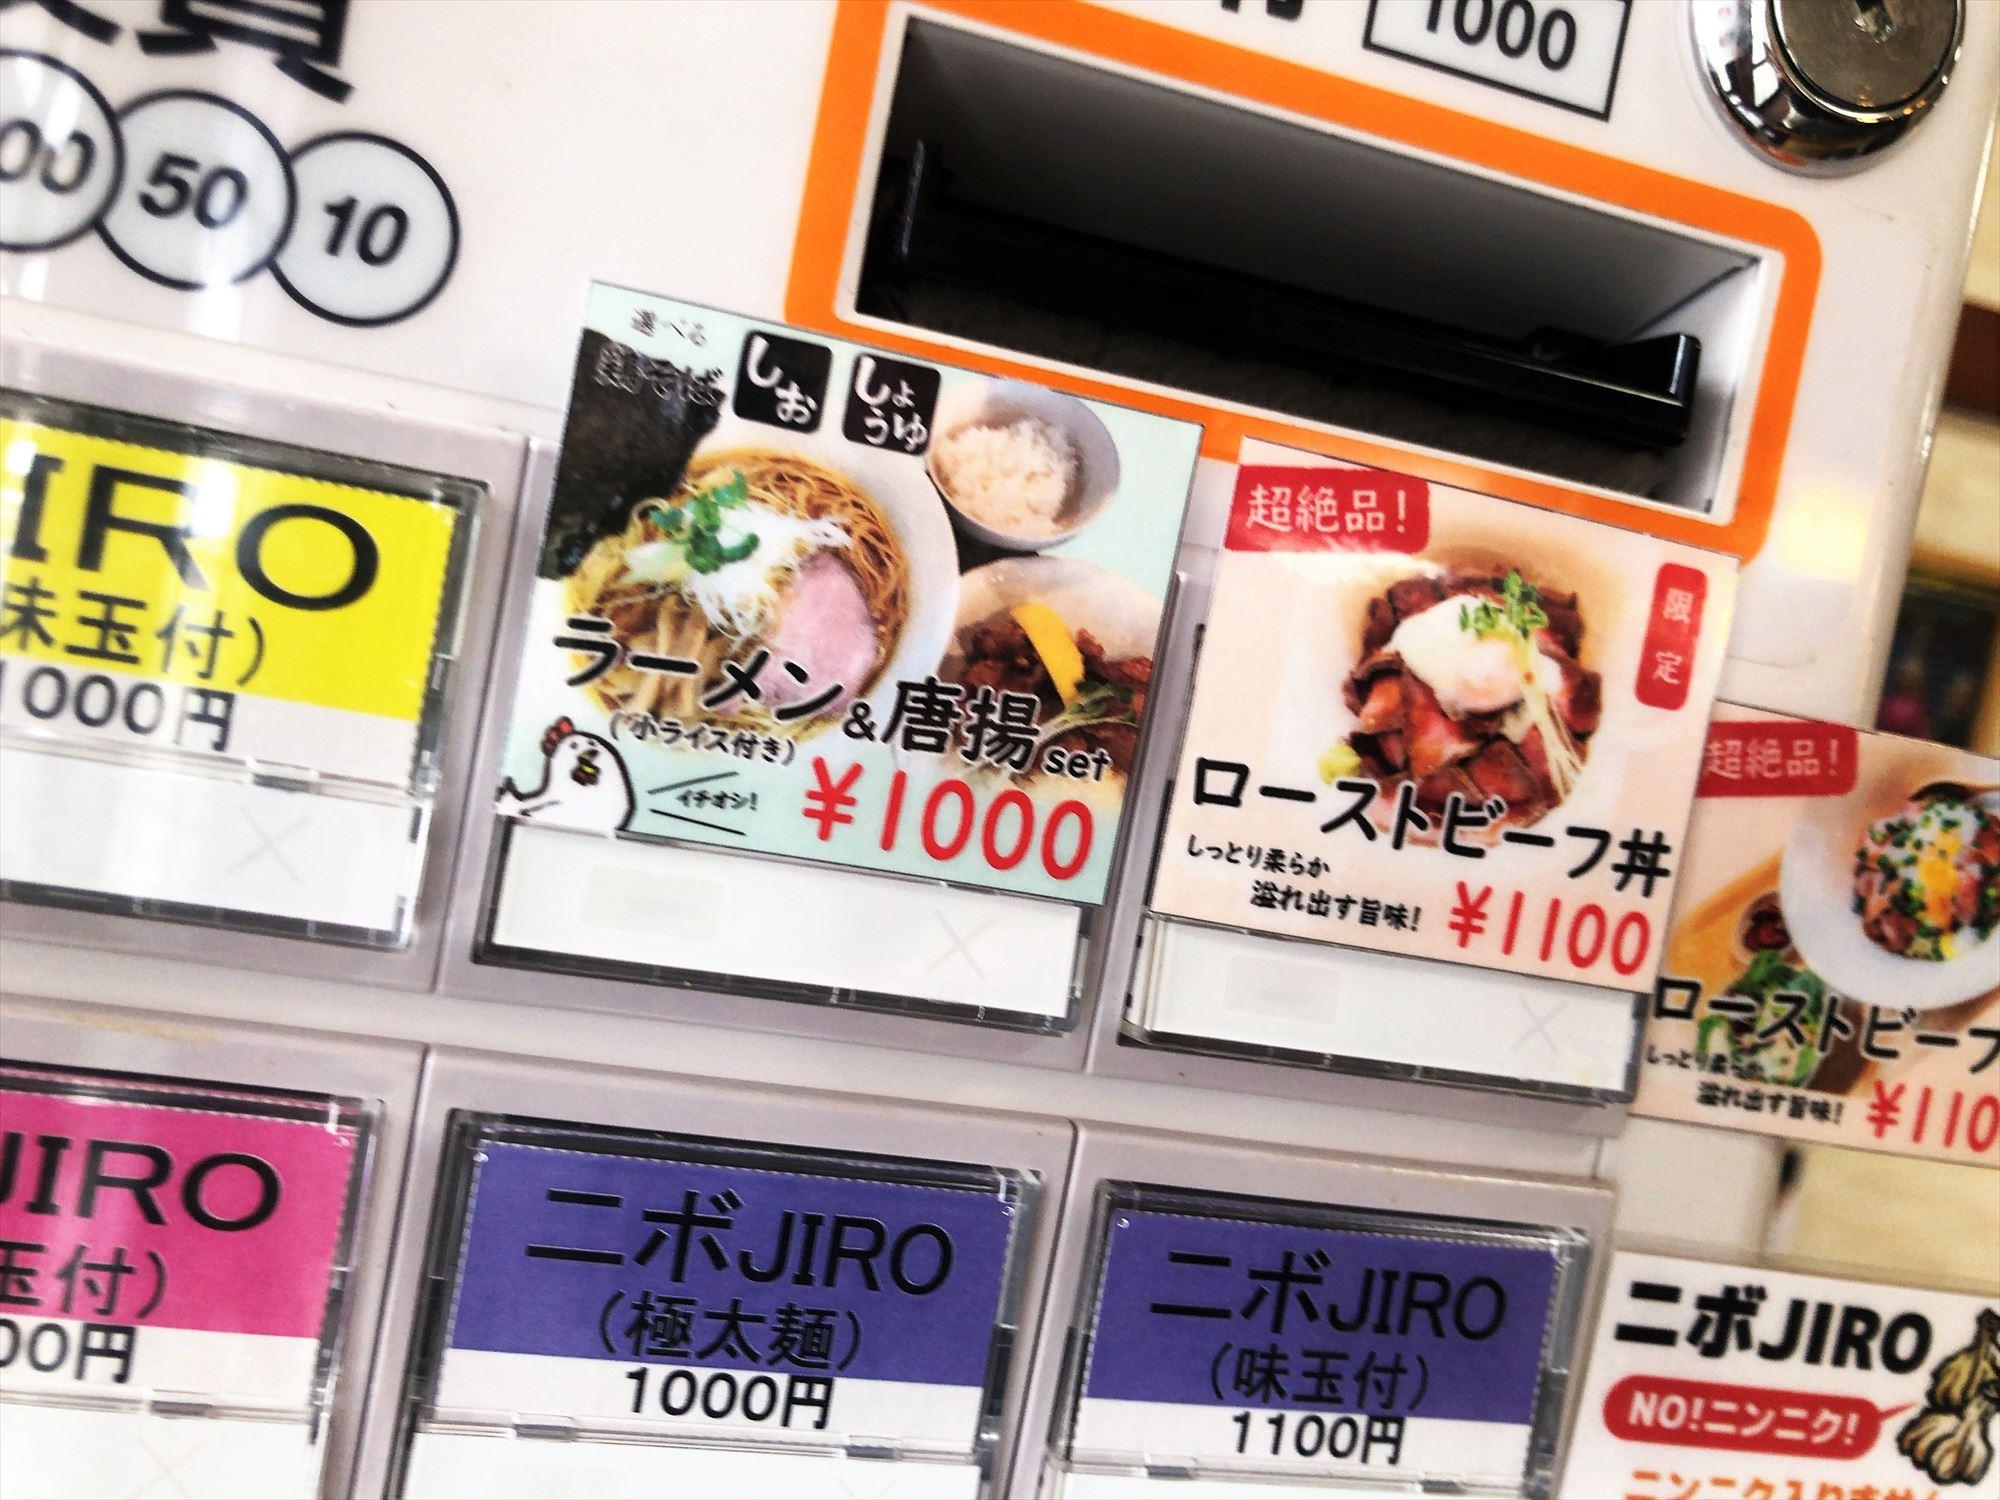 麺屋 KAZU-Gの券売機